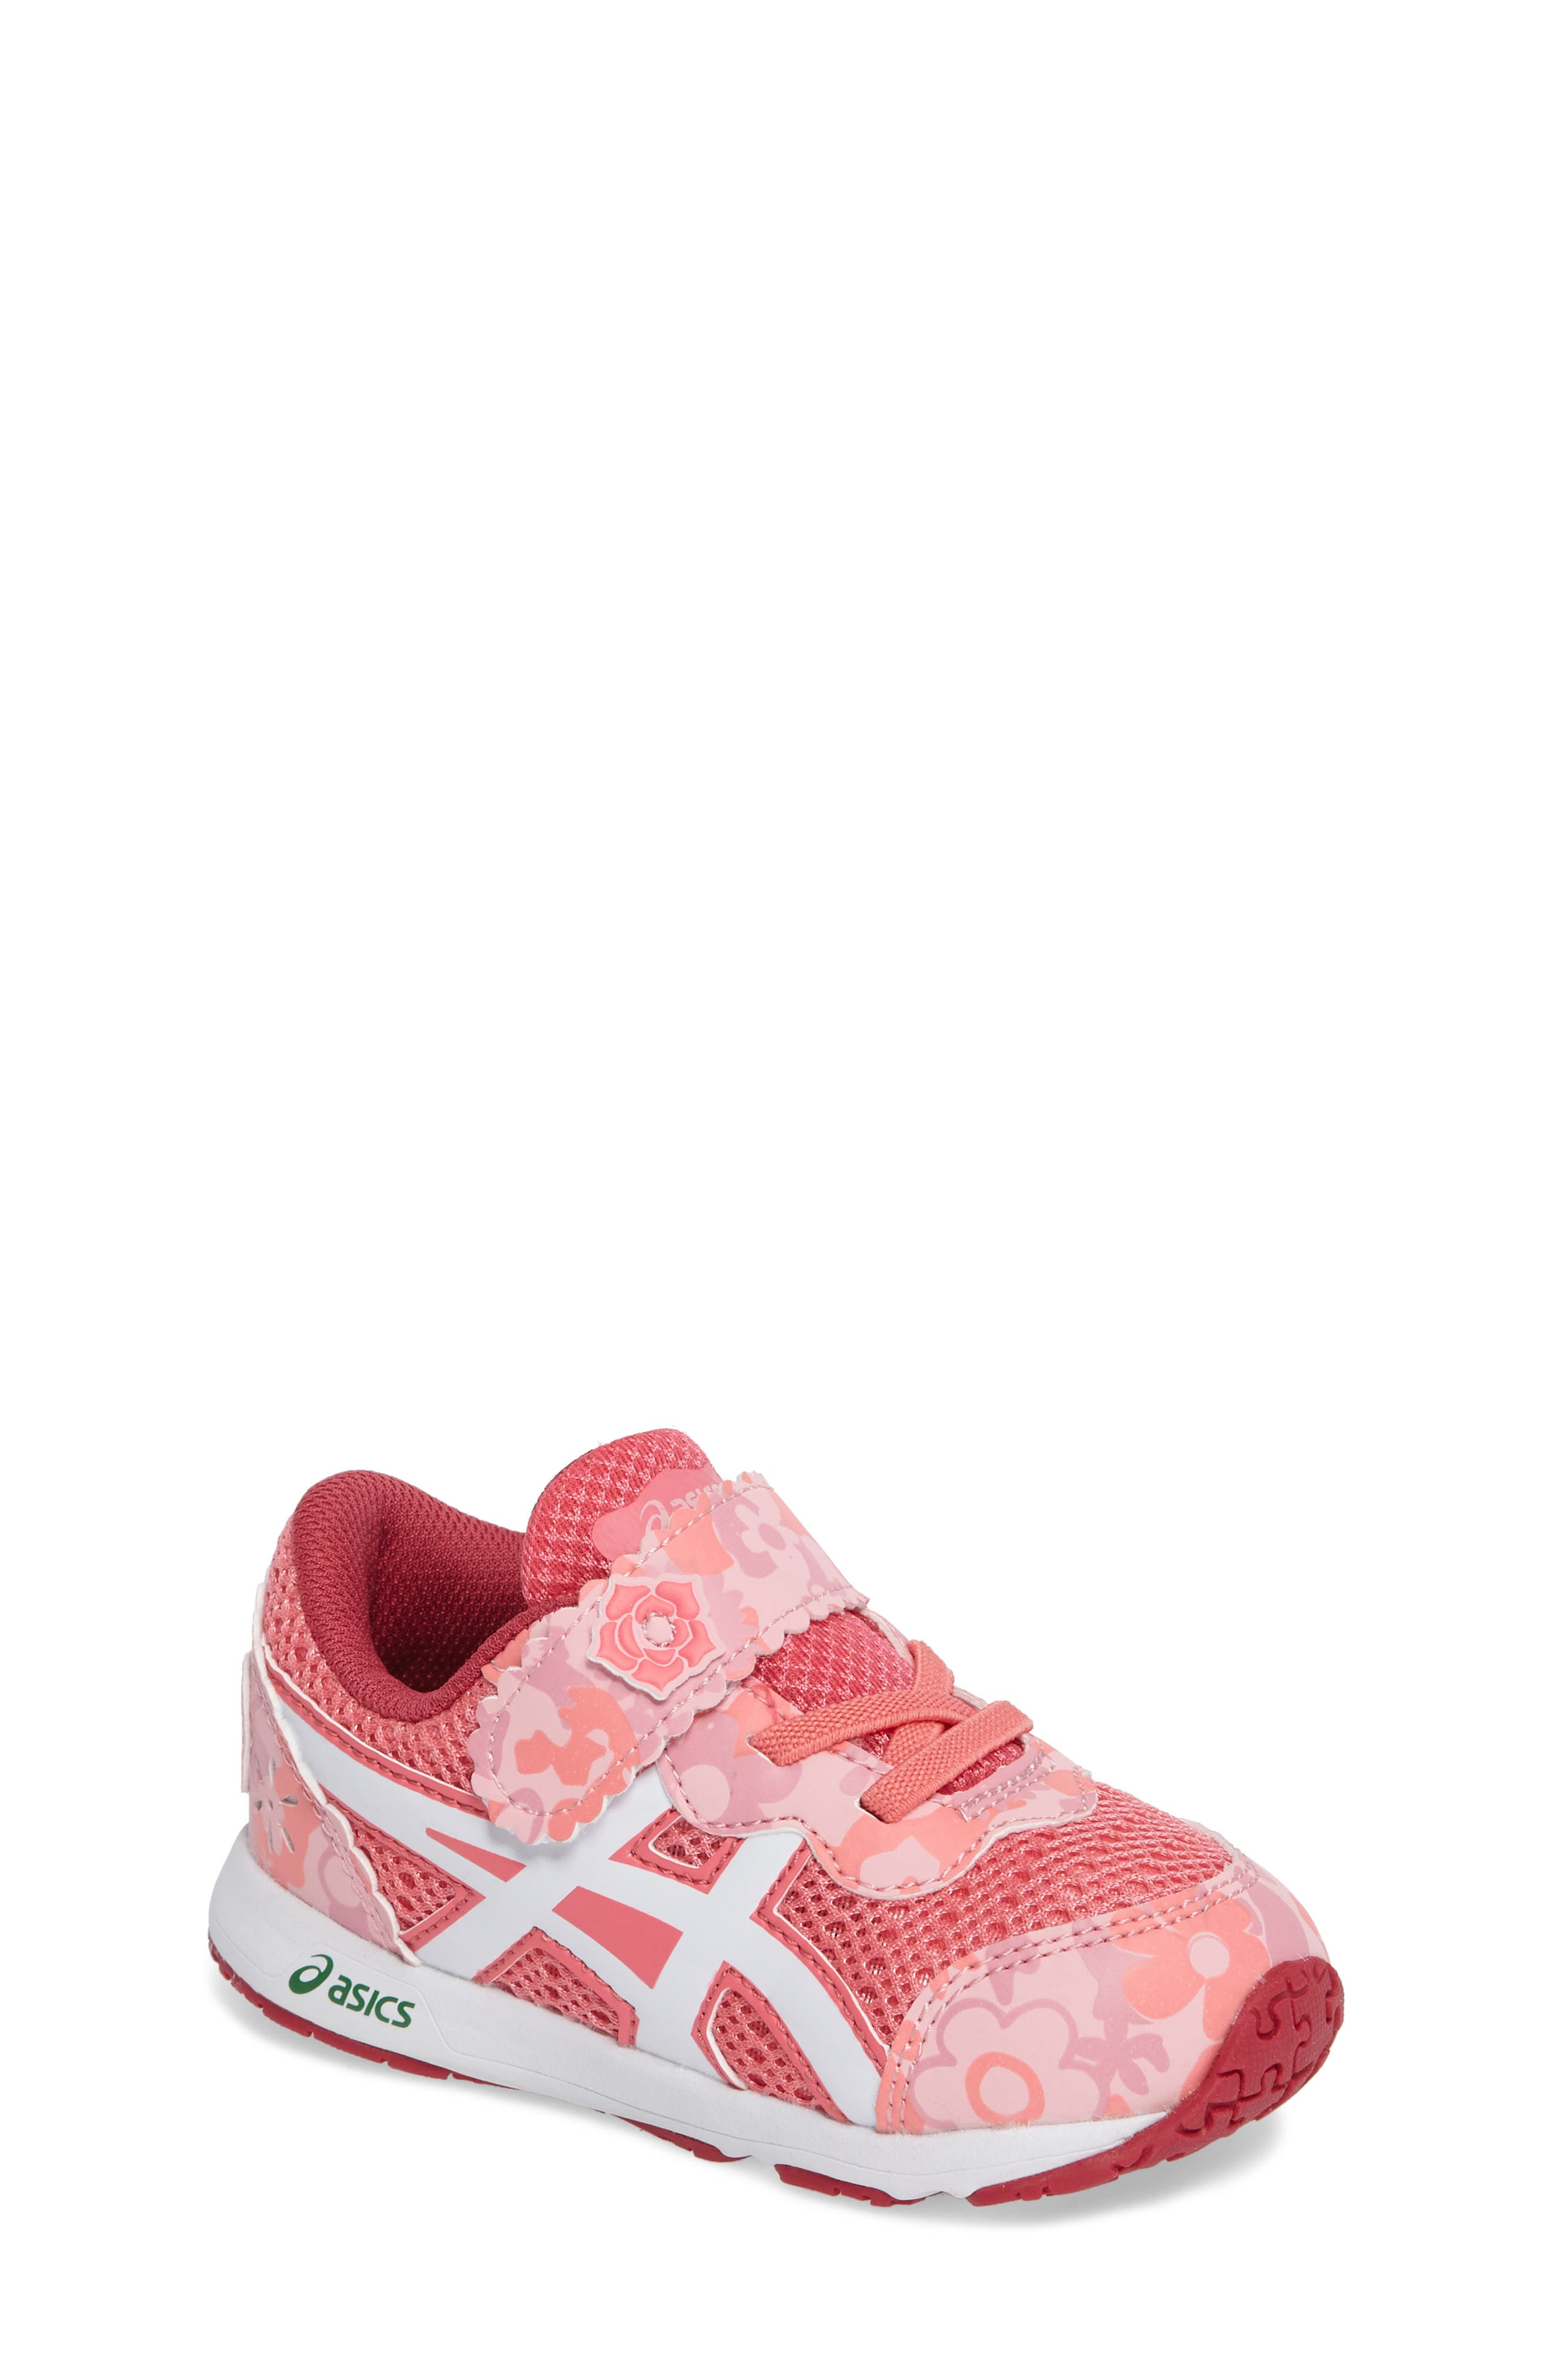 ASICS<SUP>®</SUP> School Yard TS Sneaker